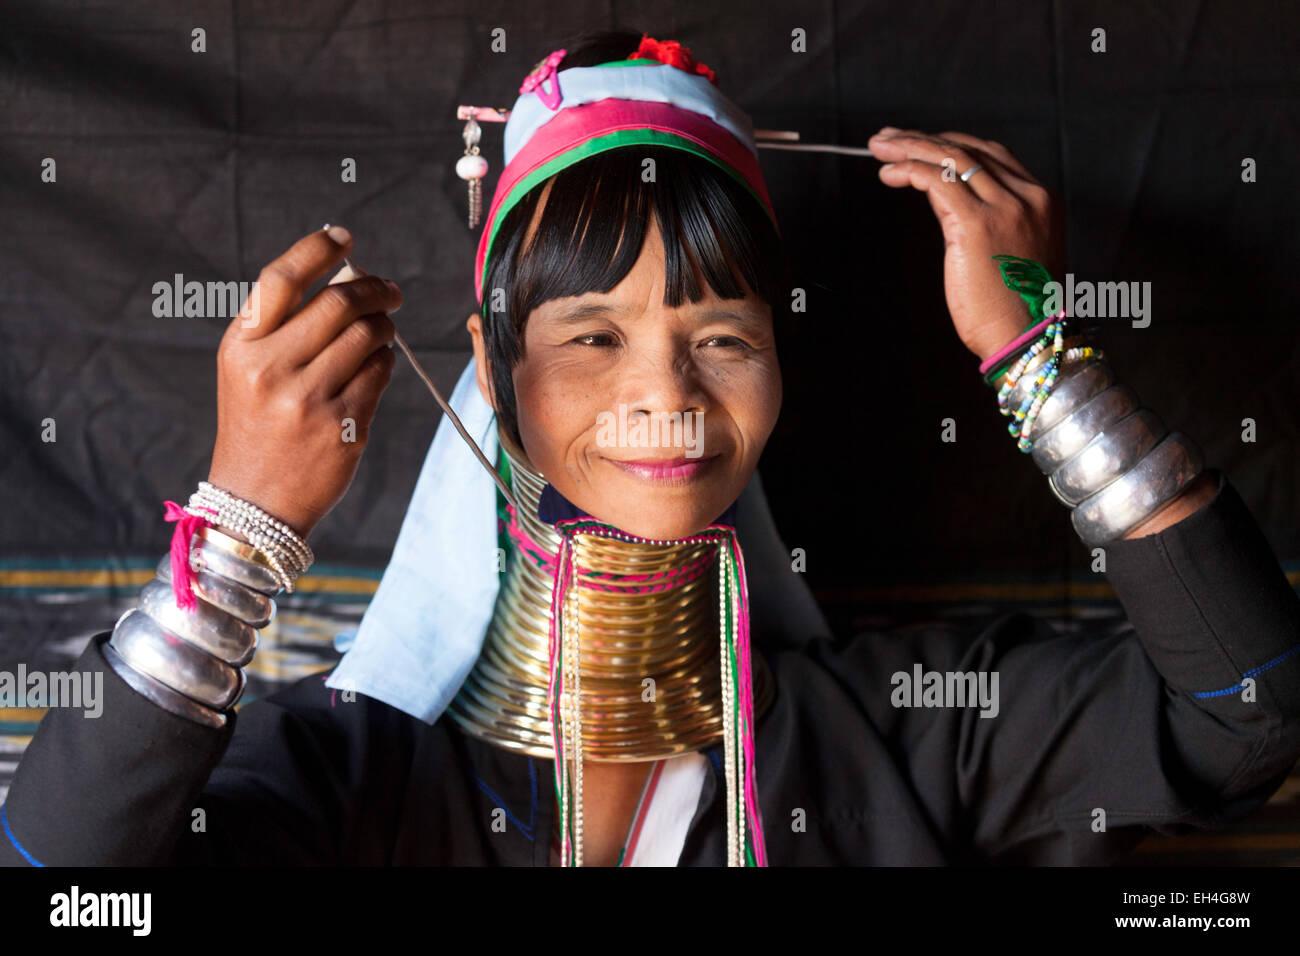 myanmar-wioman-member-of-the-kayan-people-who-lengthen-their-necks-EH4G8W.jpg